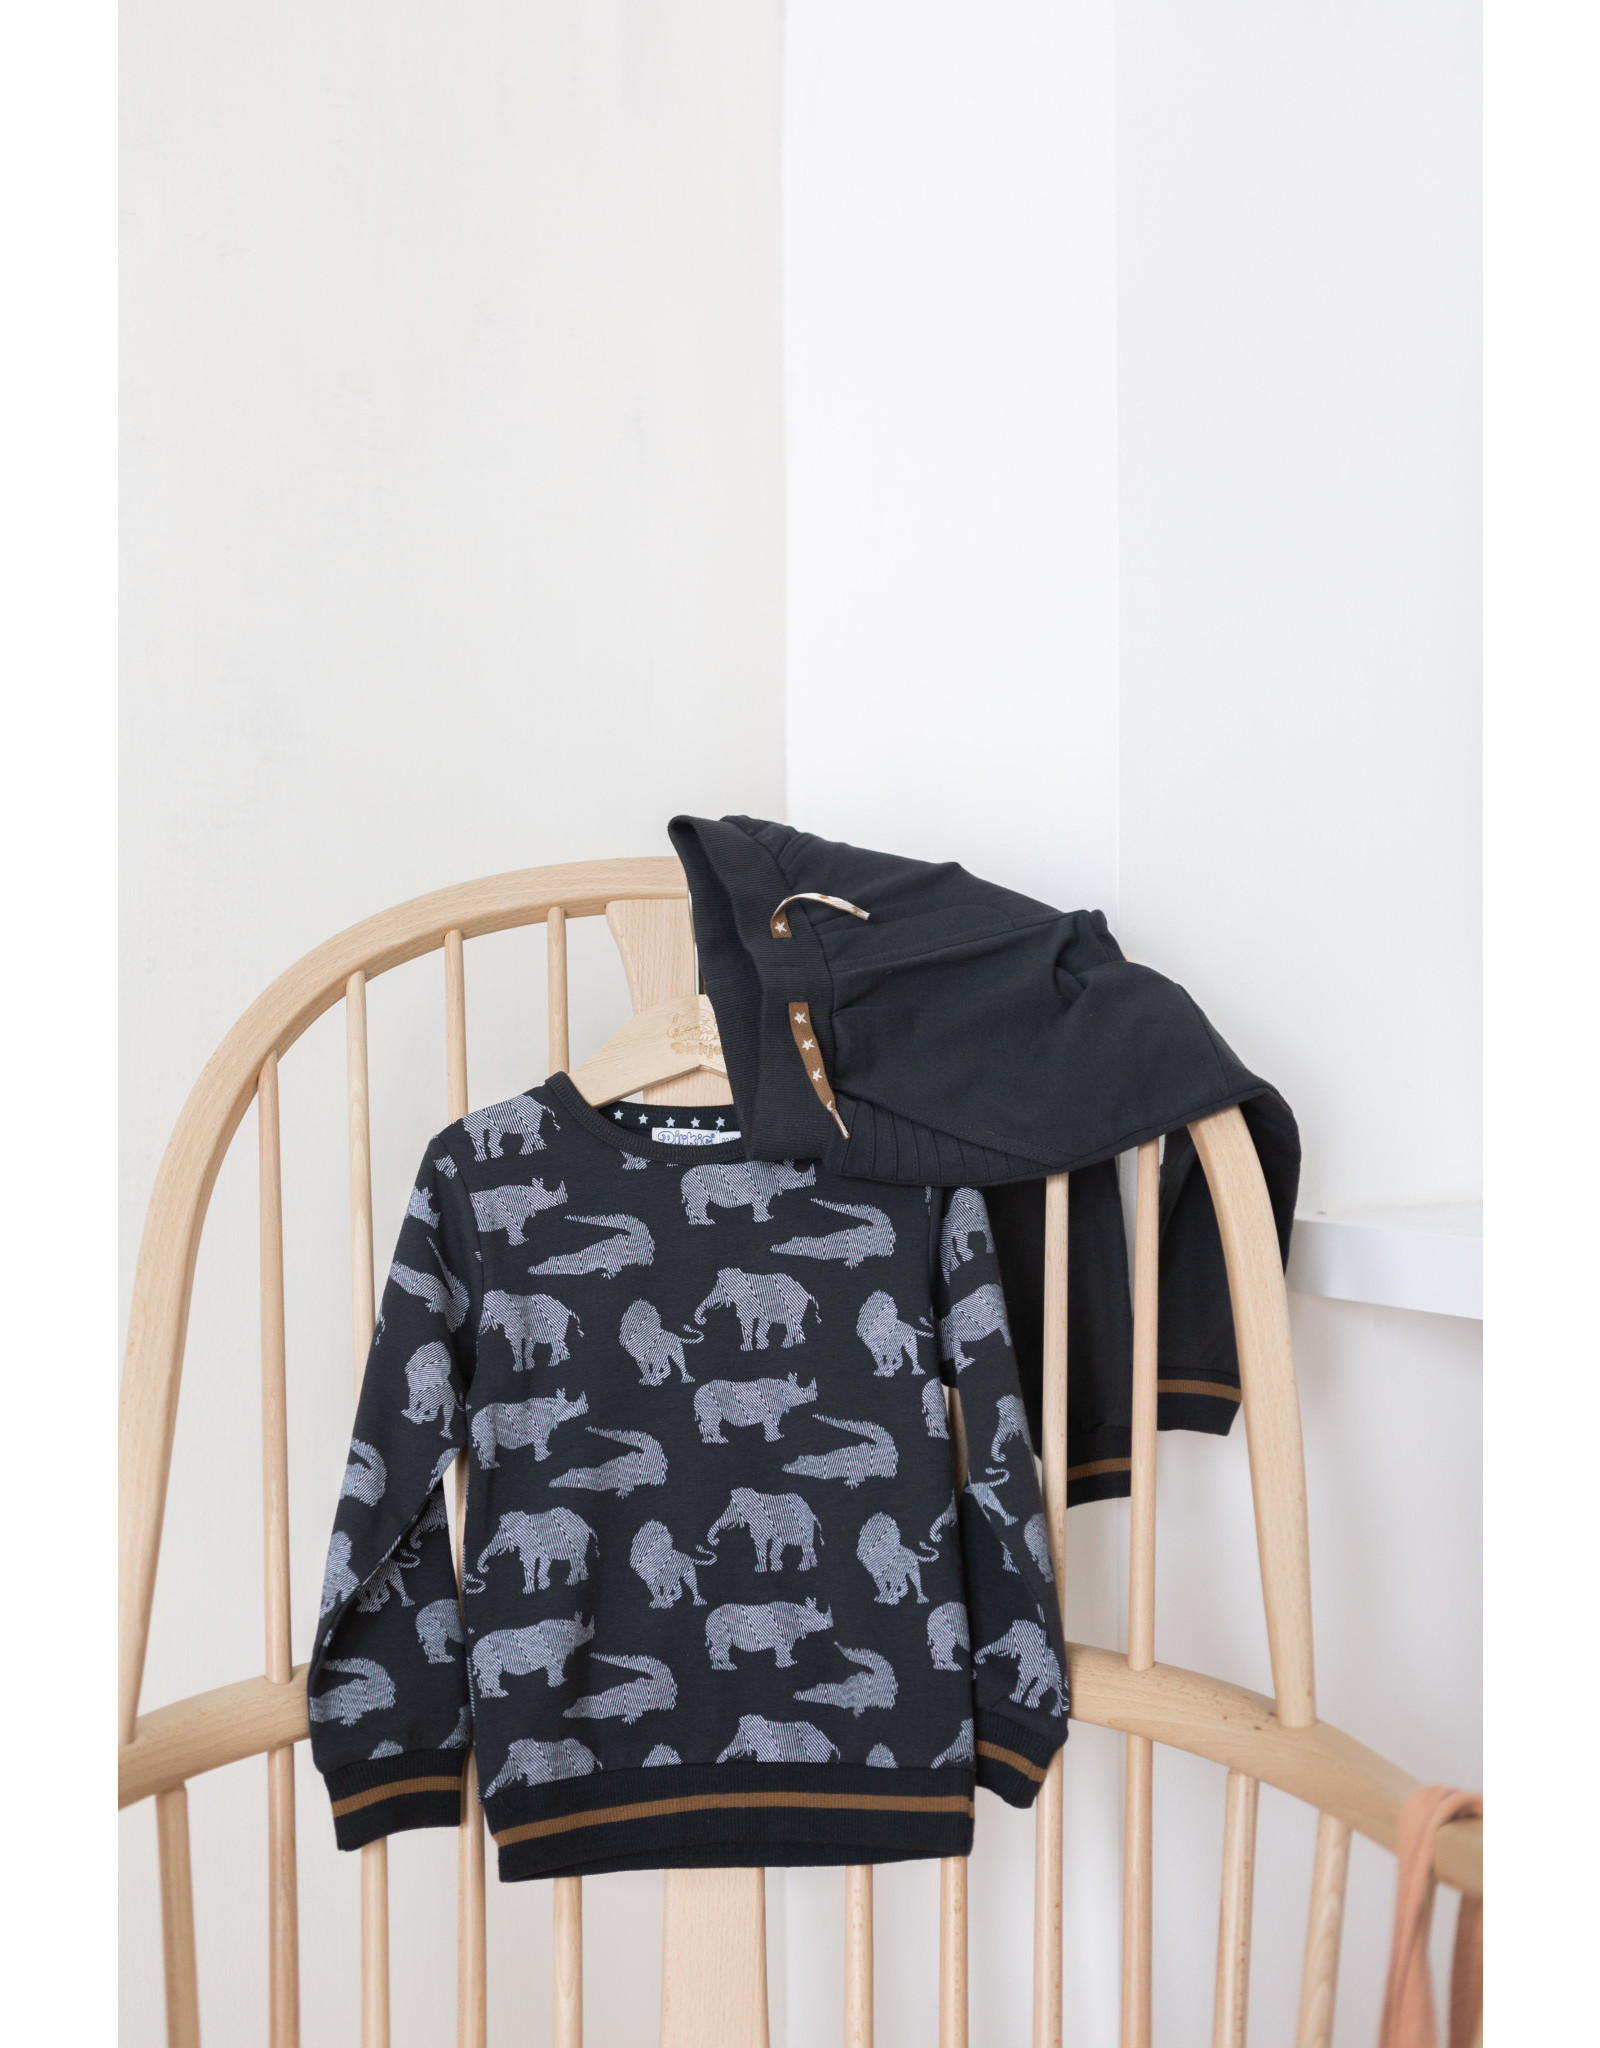 Dirkje Dirkje baby jongens sweater Animals Anthracite Off White